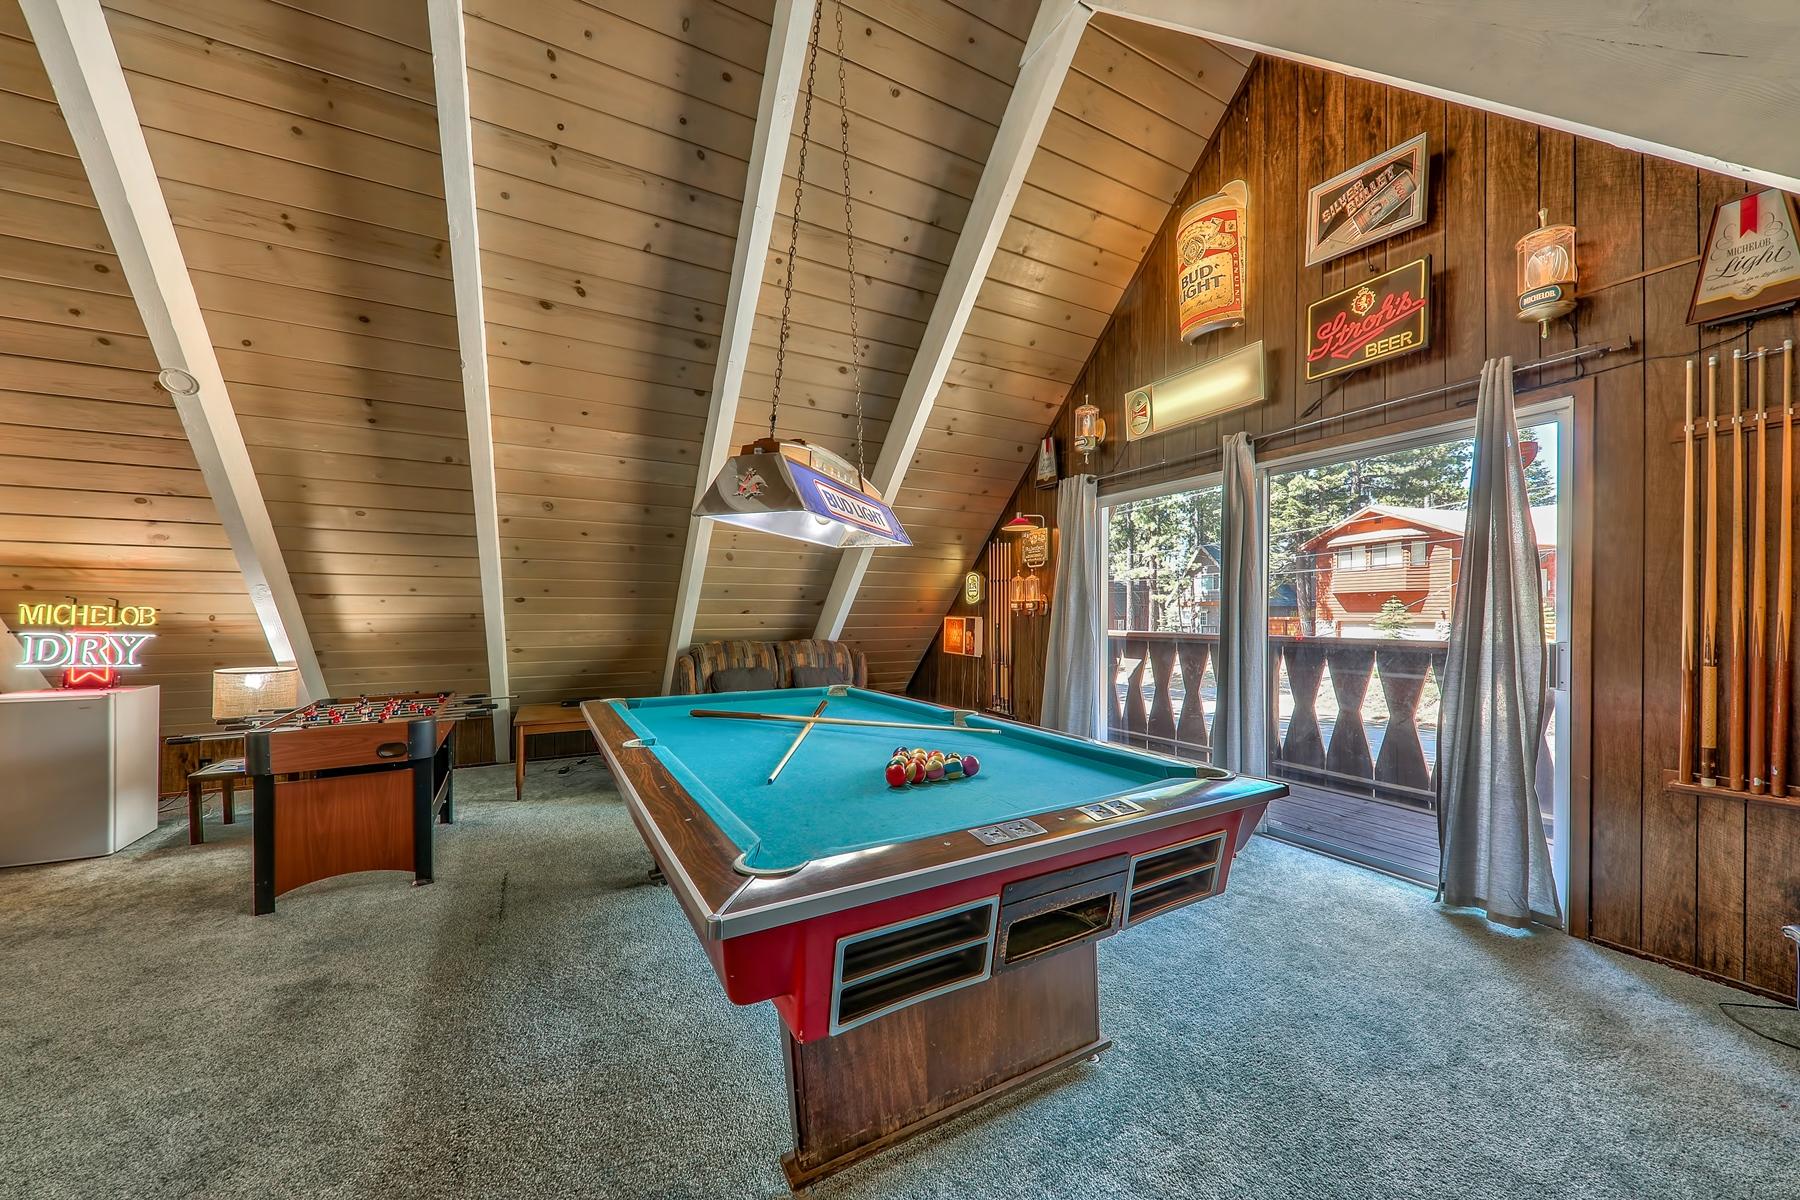 Additional photo for property listing at 1945 Koyukon Drive, South Lake Tahoe, CA 96150 1945 Koyukon Drive South Lake Tahoe, California 96150 United States